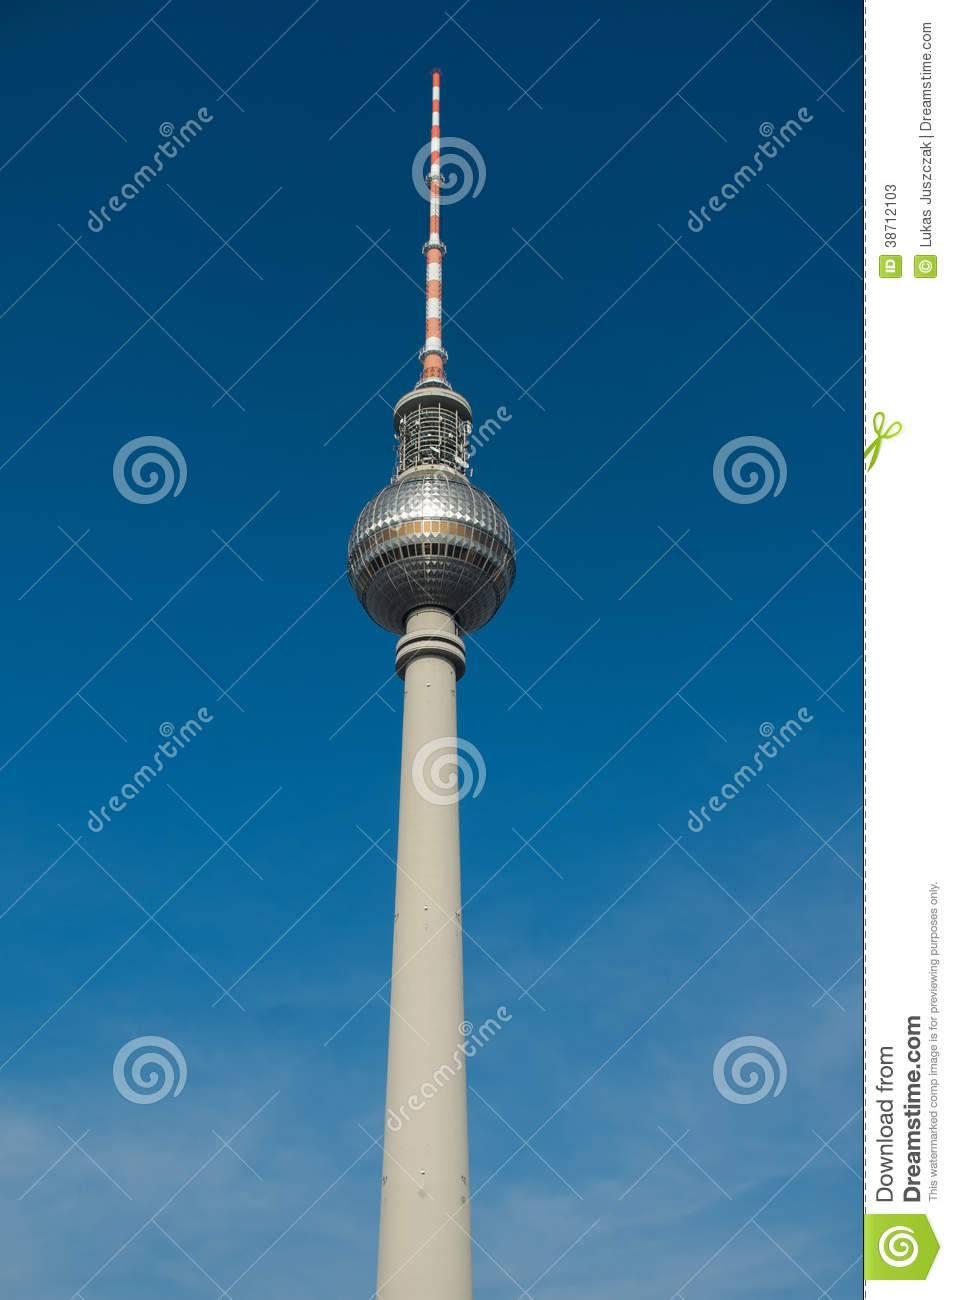 Берлинская телебашня (fernsehturm)